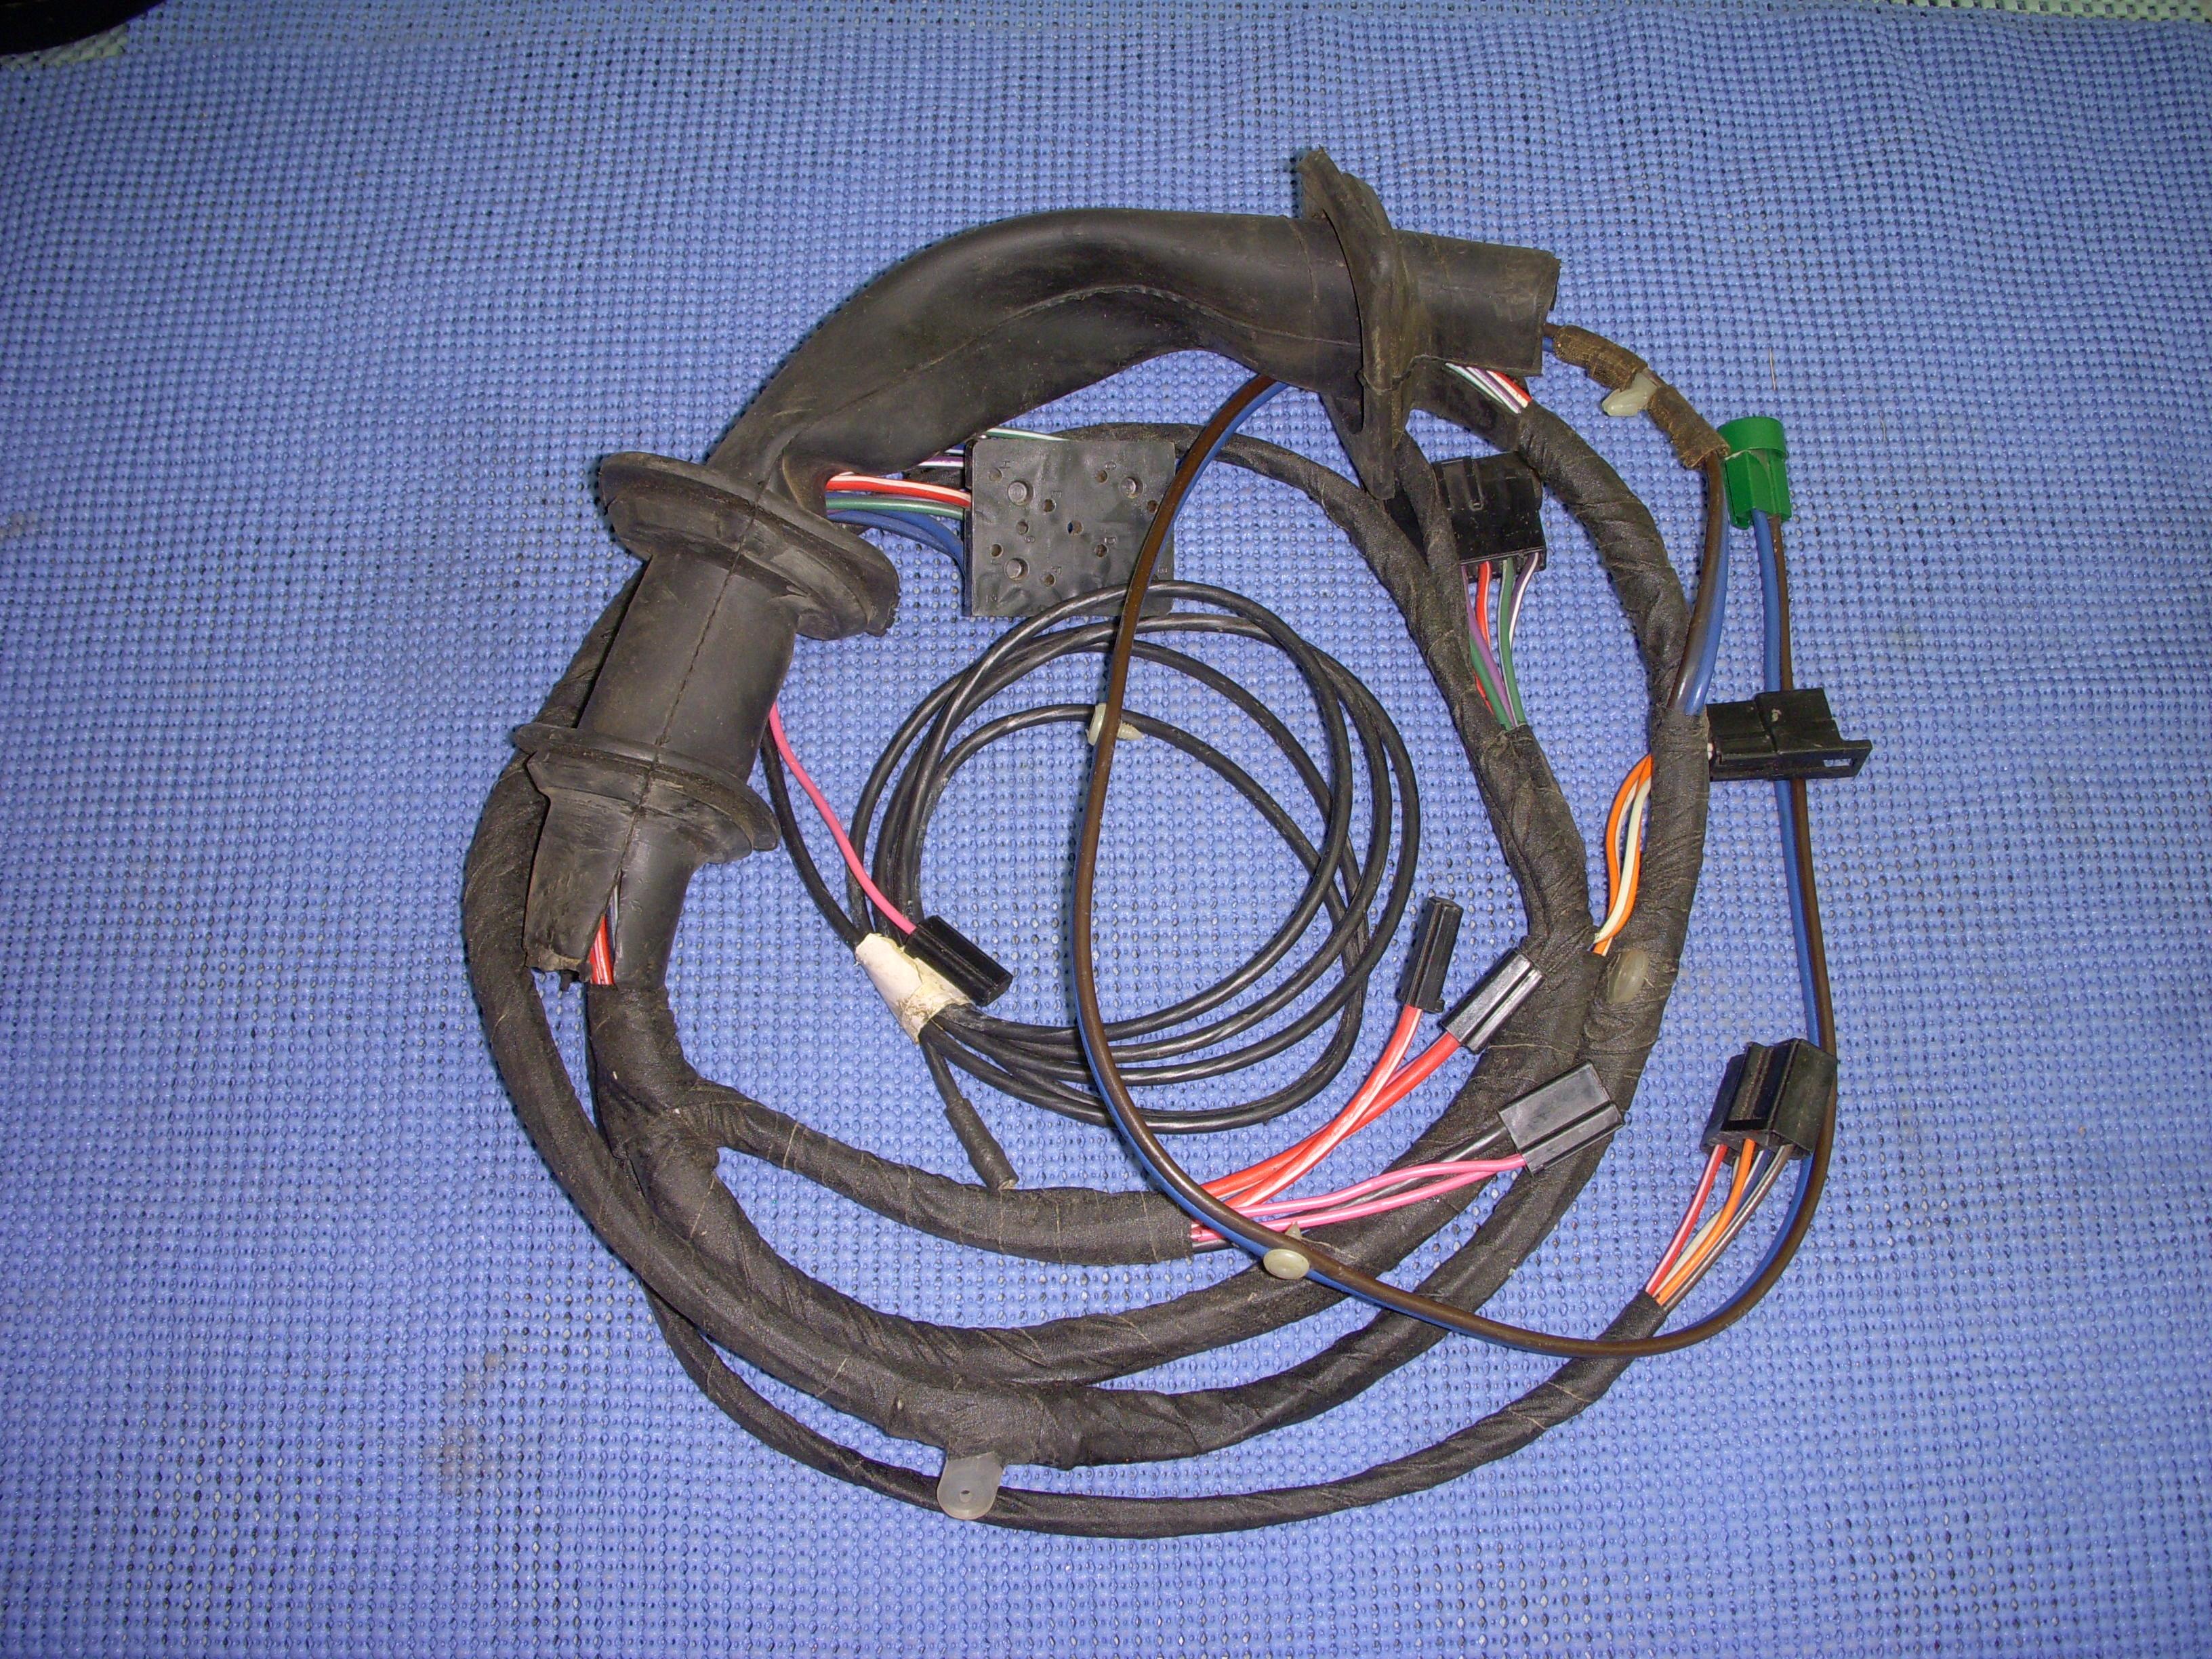 DSCN6370?resize\=300%2C300\&ssl\=1 wiring harness gm 1893623,harness \u2022 limouge co  at readyjetset.co